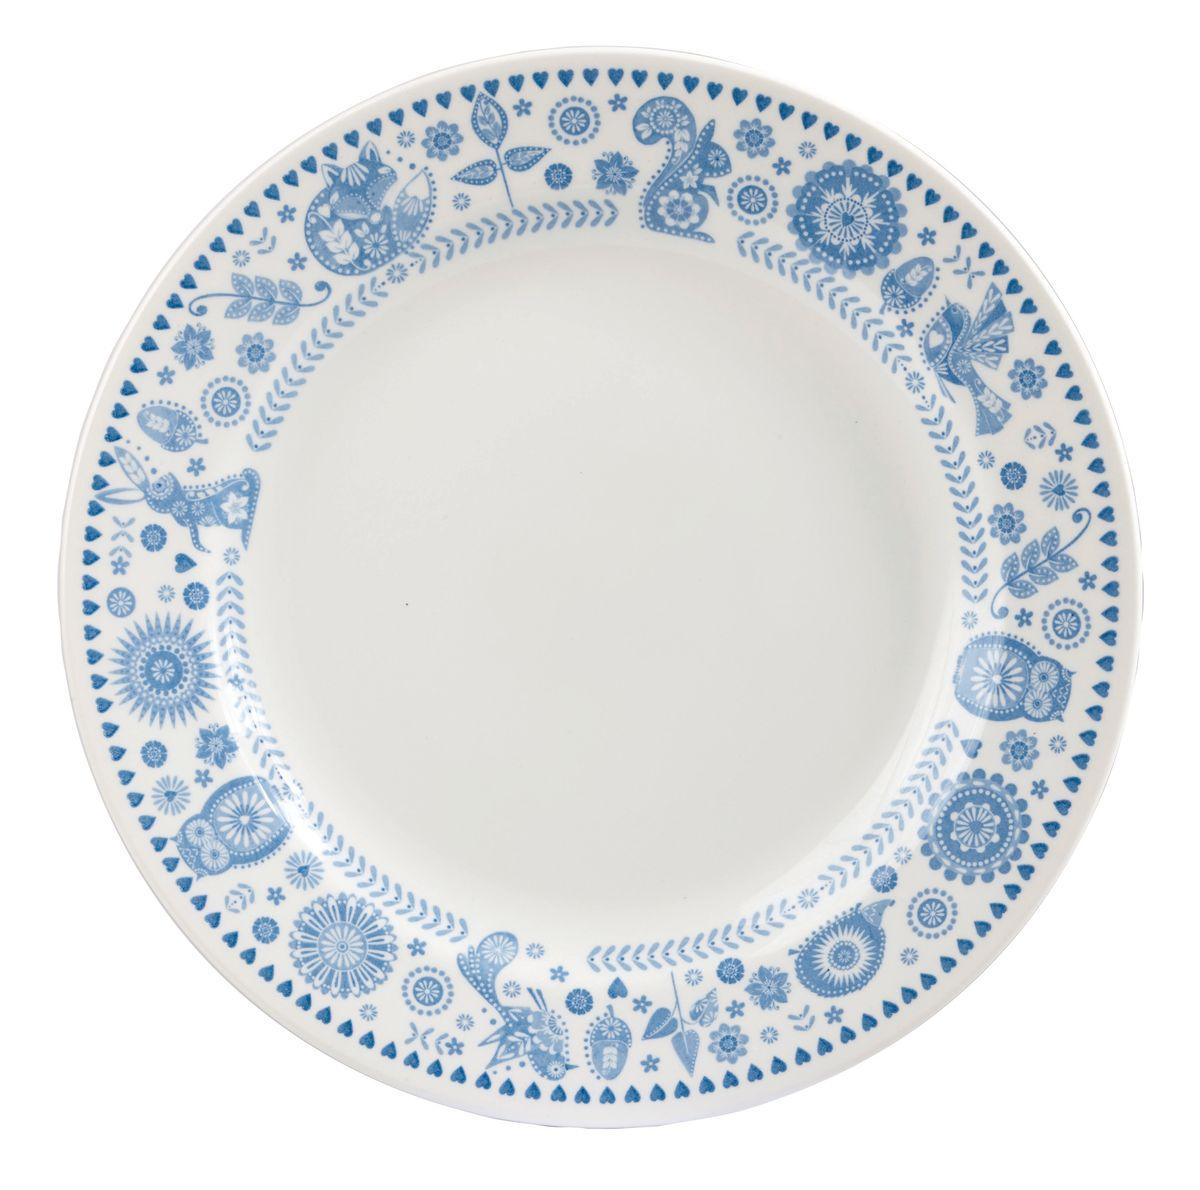 Тарелка обеденная Churchill Пензанс, диаметр 26 см тарелка обеденная terracotta дерево жизни диаметр 26 см